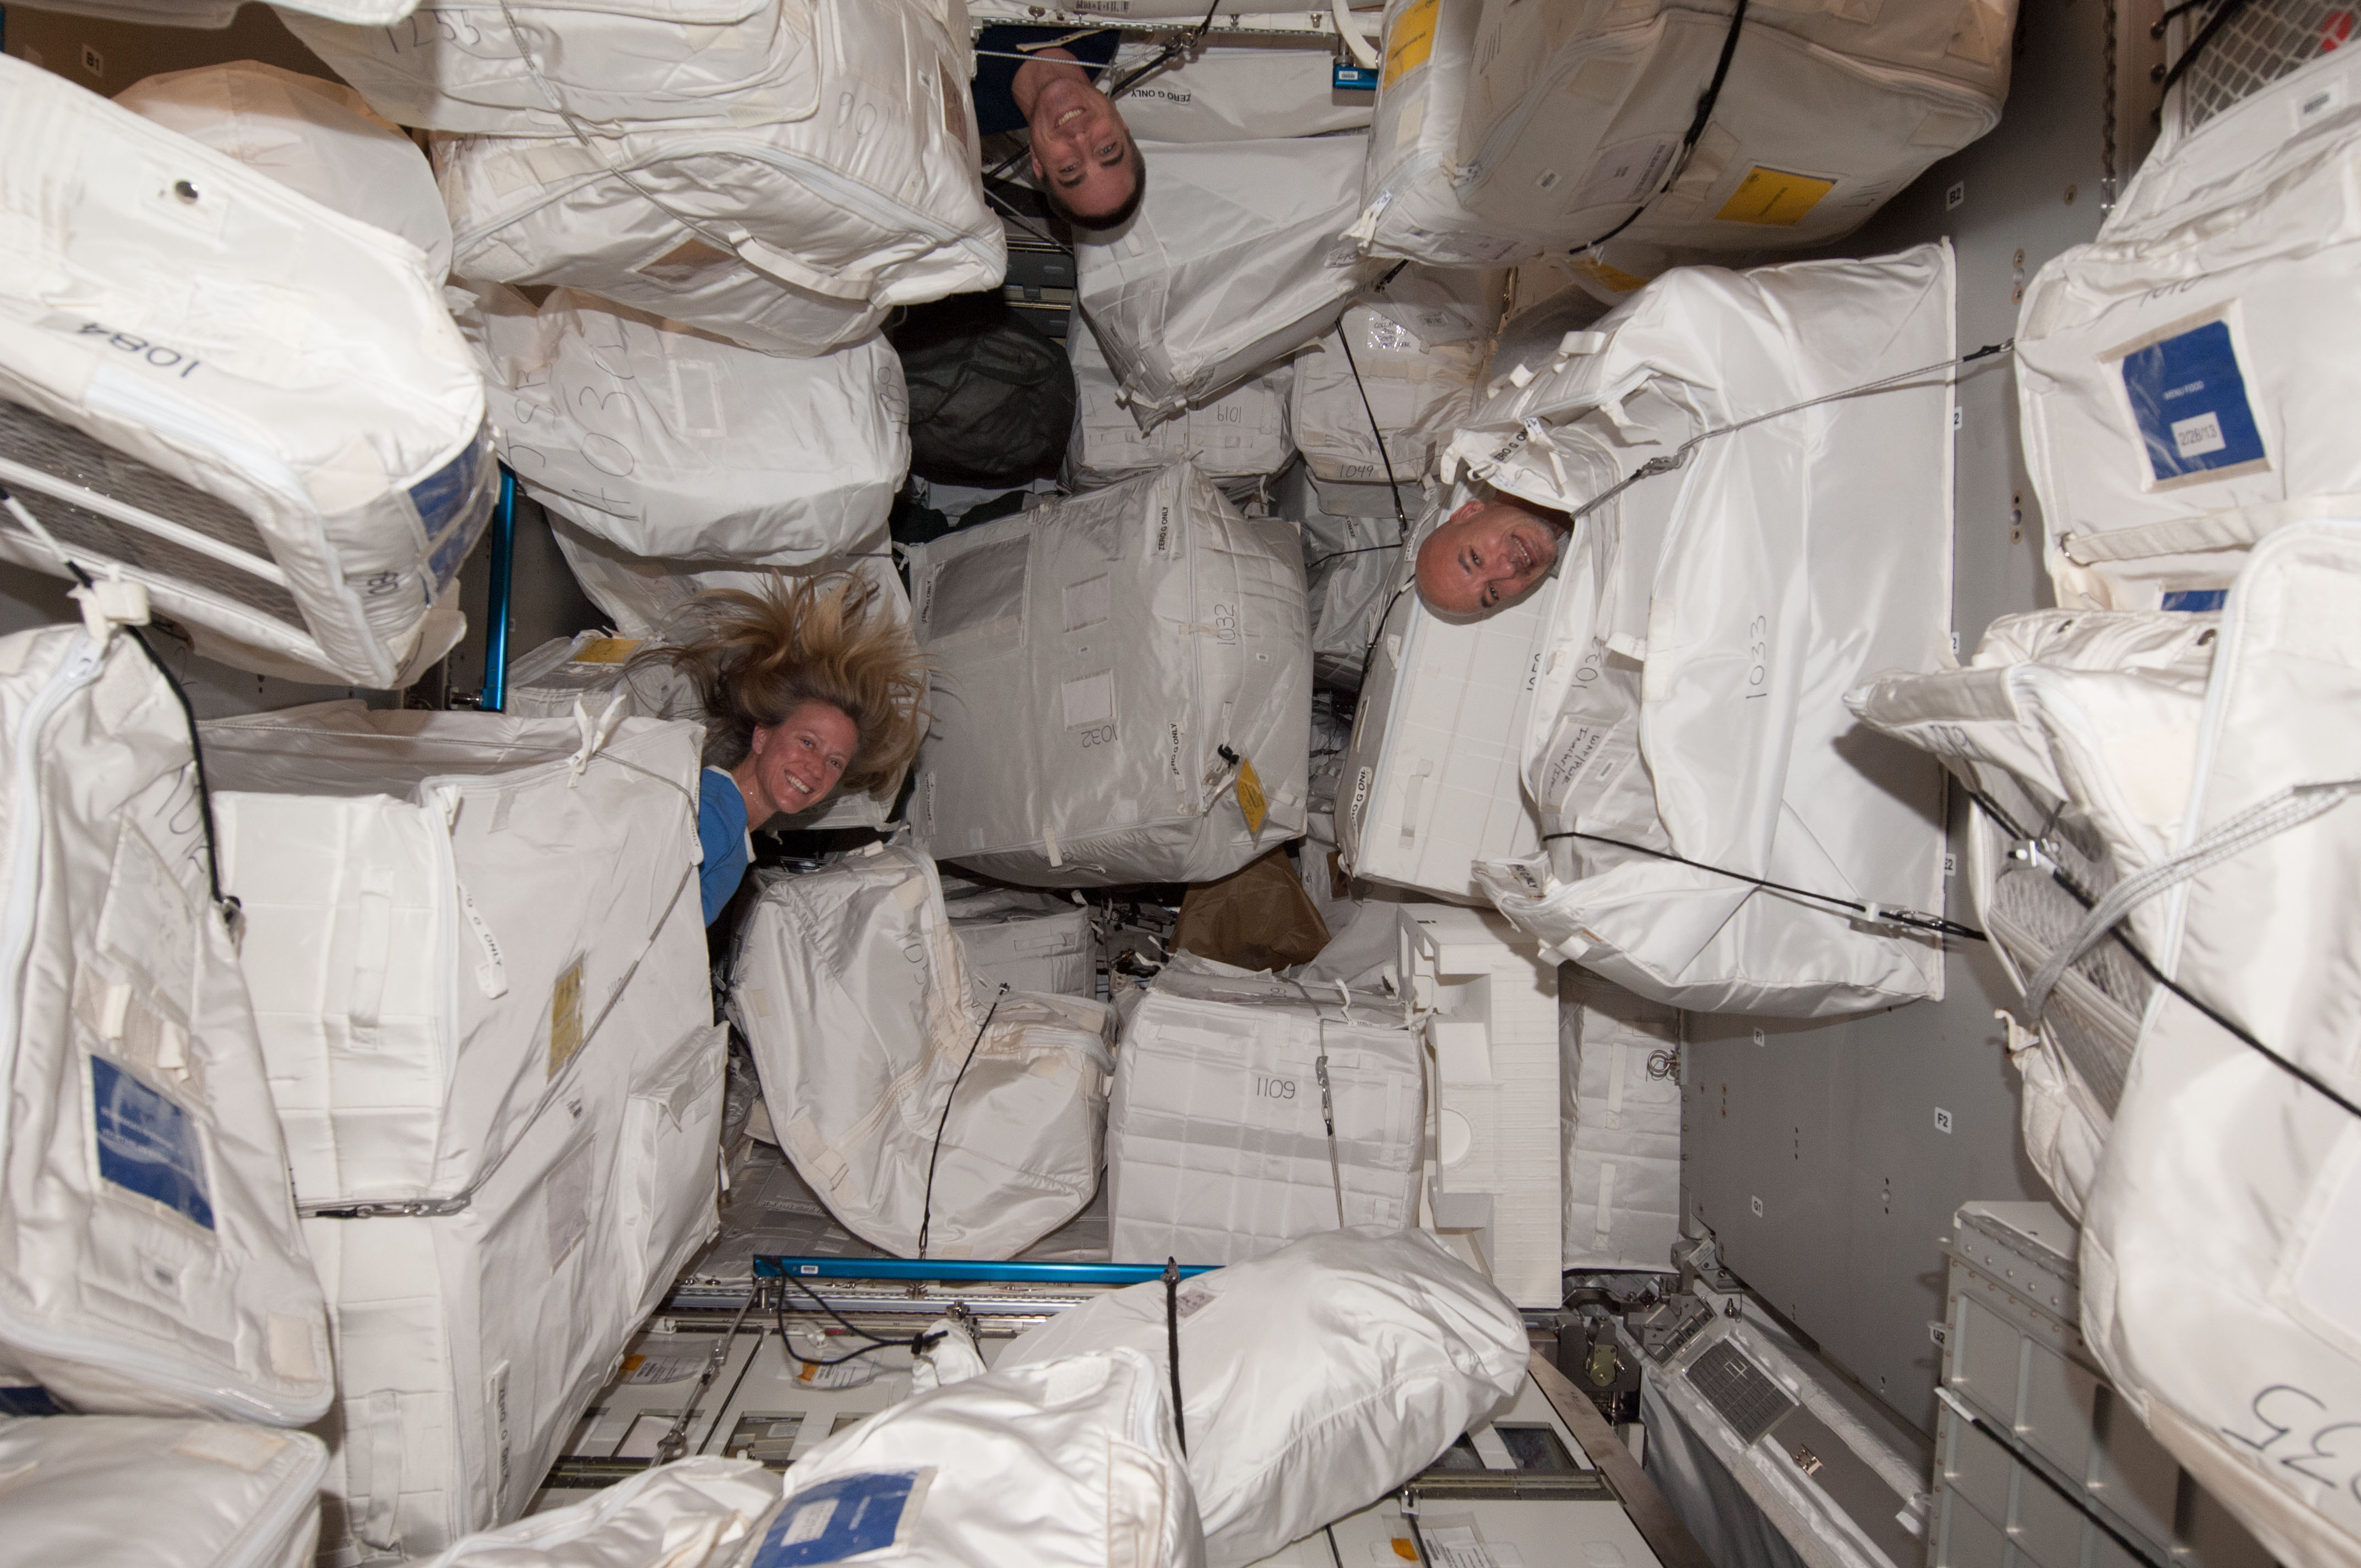 chris nyberg astronaut - photo #19